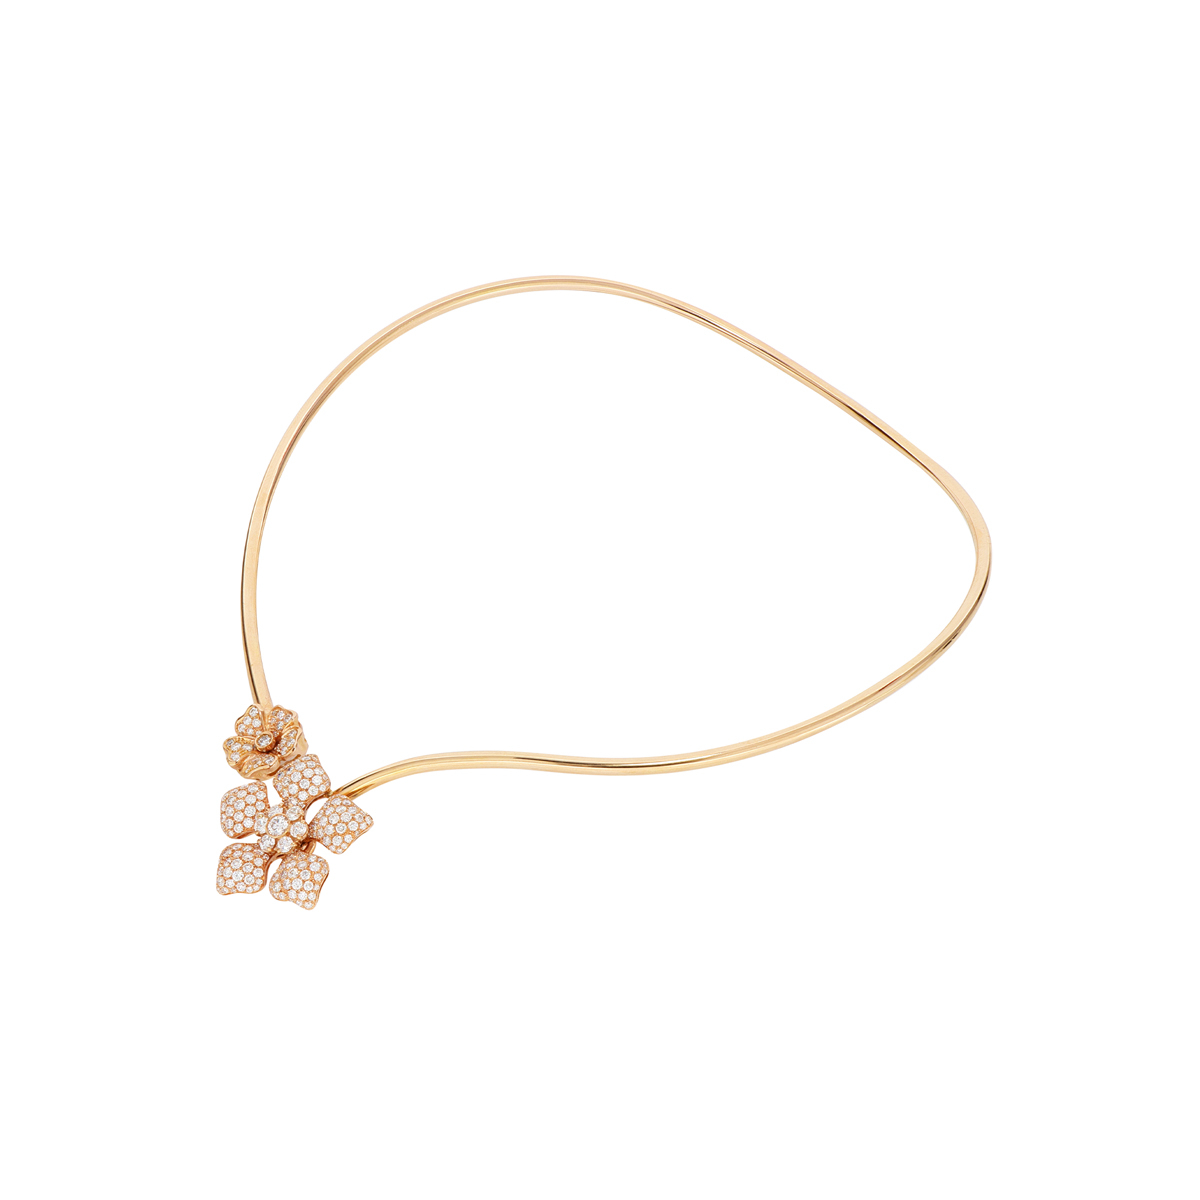 Adjustable Open Collar Diamond Flower Necklace